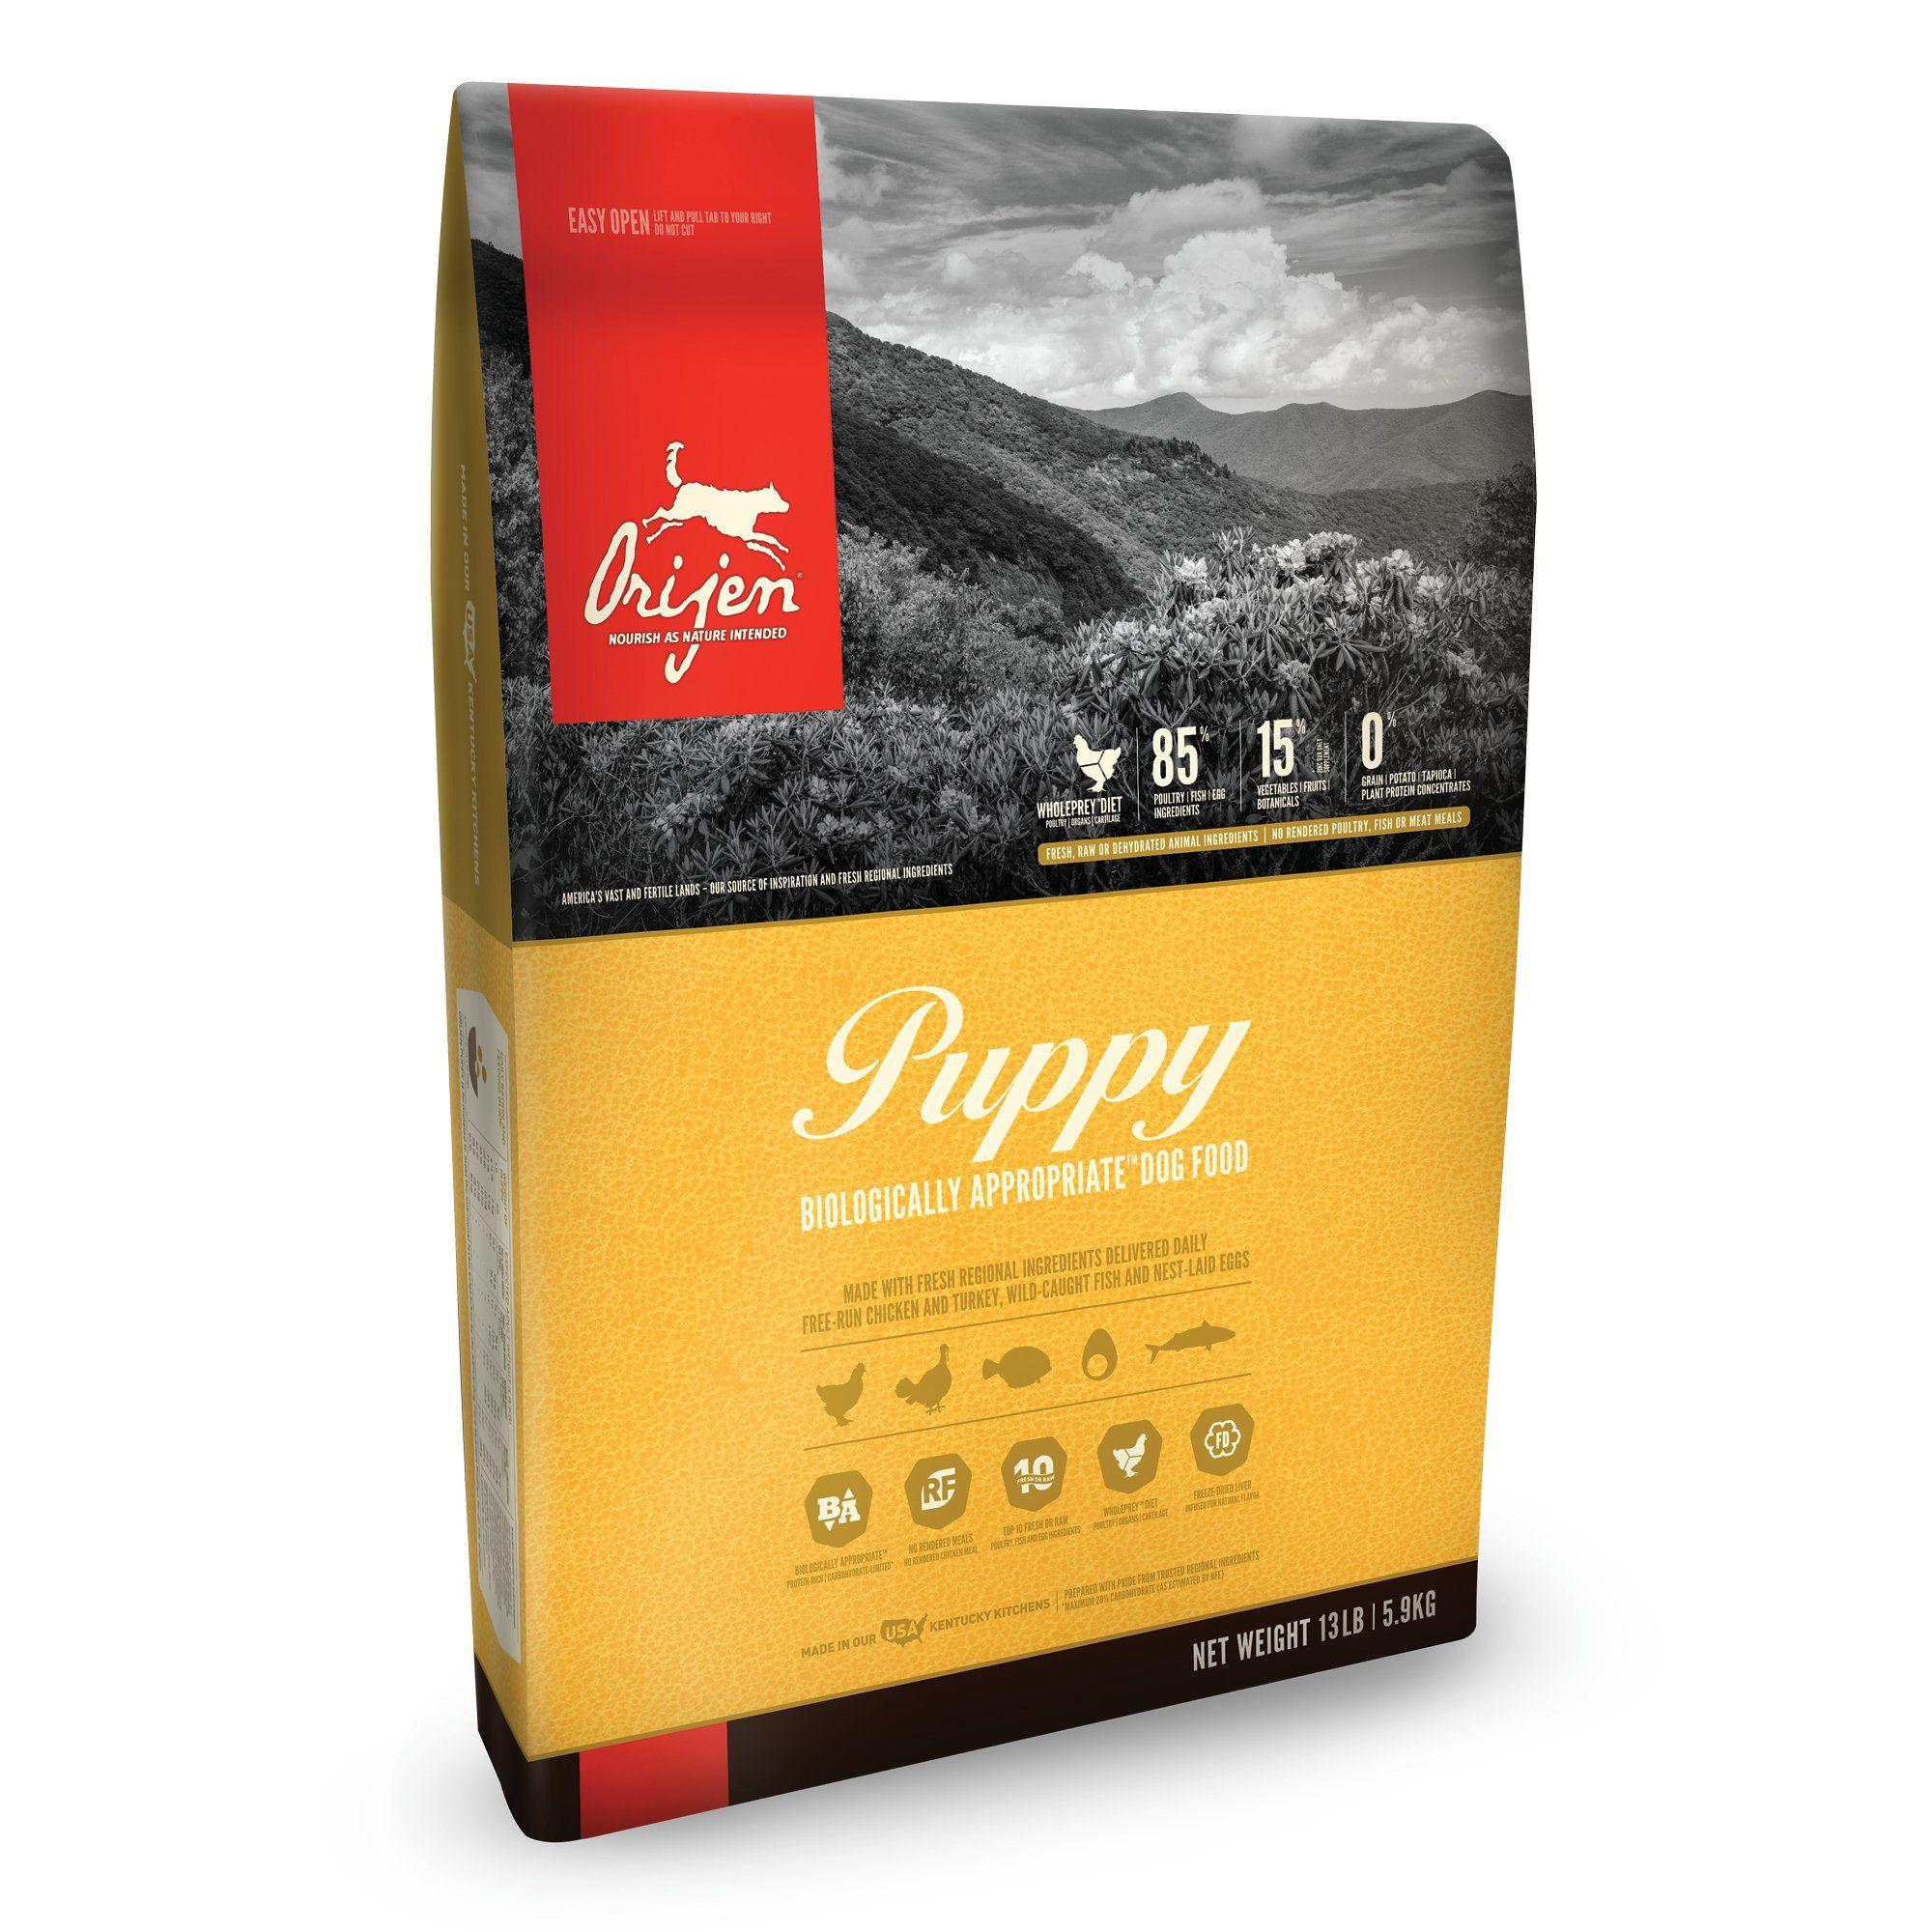 Orijen Puppy Dry Dog Food 13 Lbs Grain Free Dog Food Dog Food